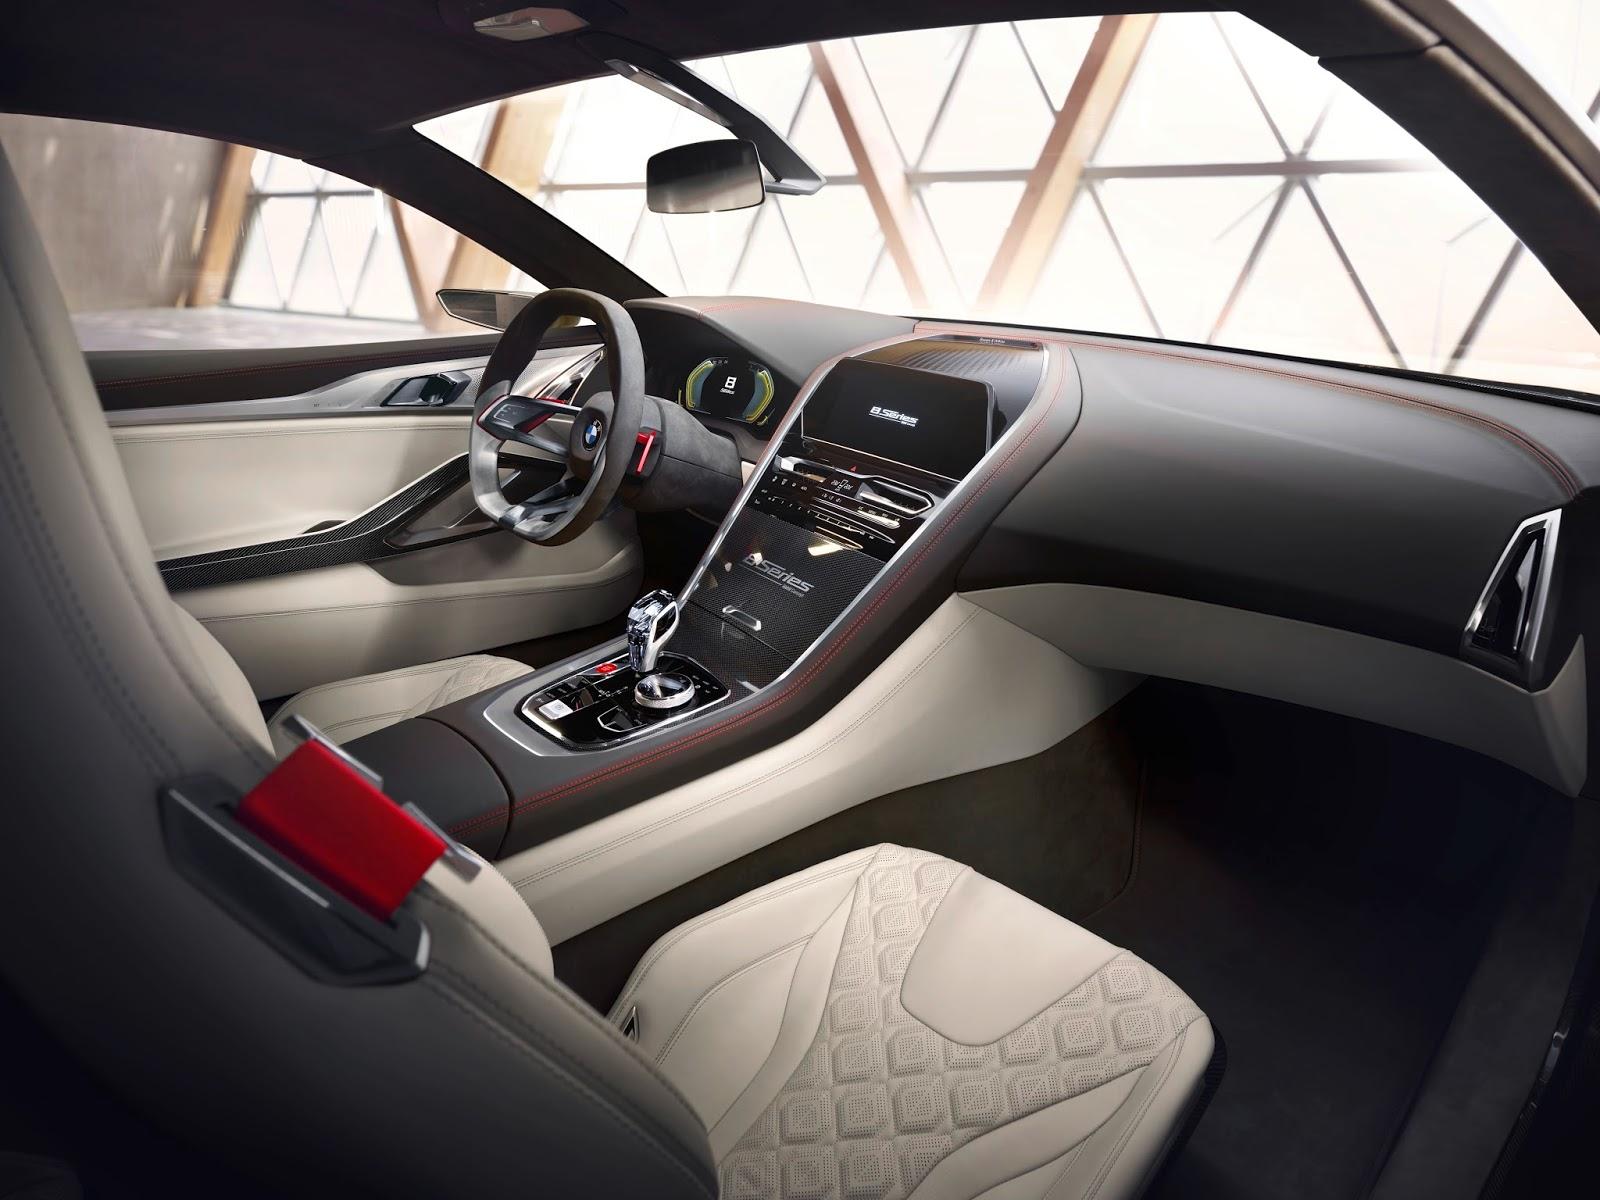 P90261160 highRes bmw concept 8 series Η BMW Σειρά 8 Coupe είναι η πεμπτουσία των μελλοντικών σπορ αυτοκινήτων BMW, BMW 8, BMW Concept, BMW Concept 8 Series, COUPE, dream car